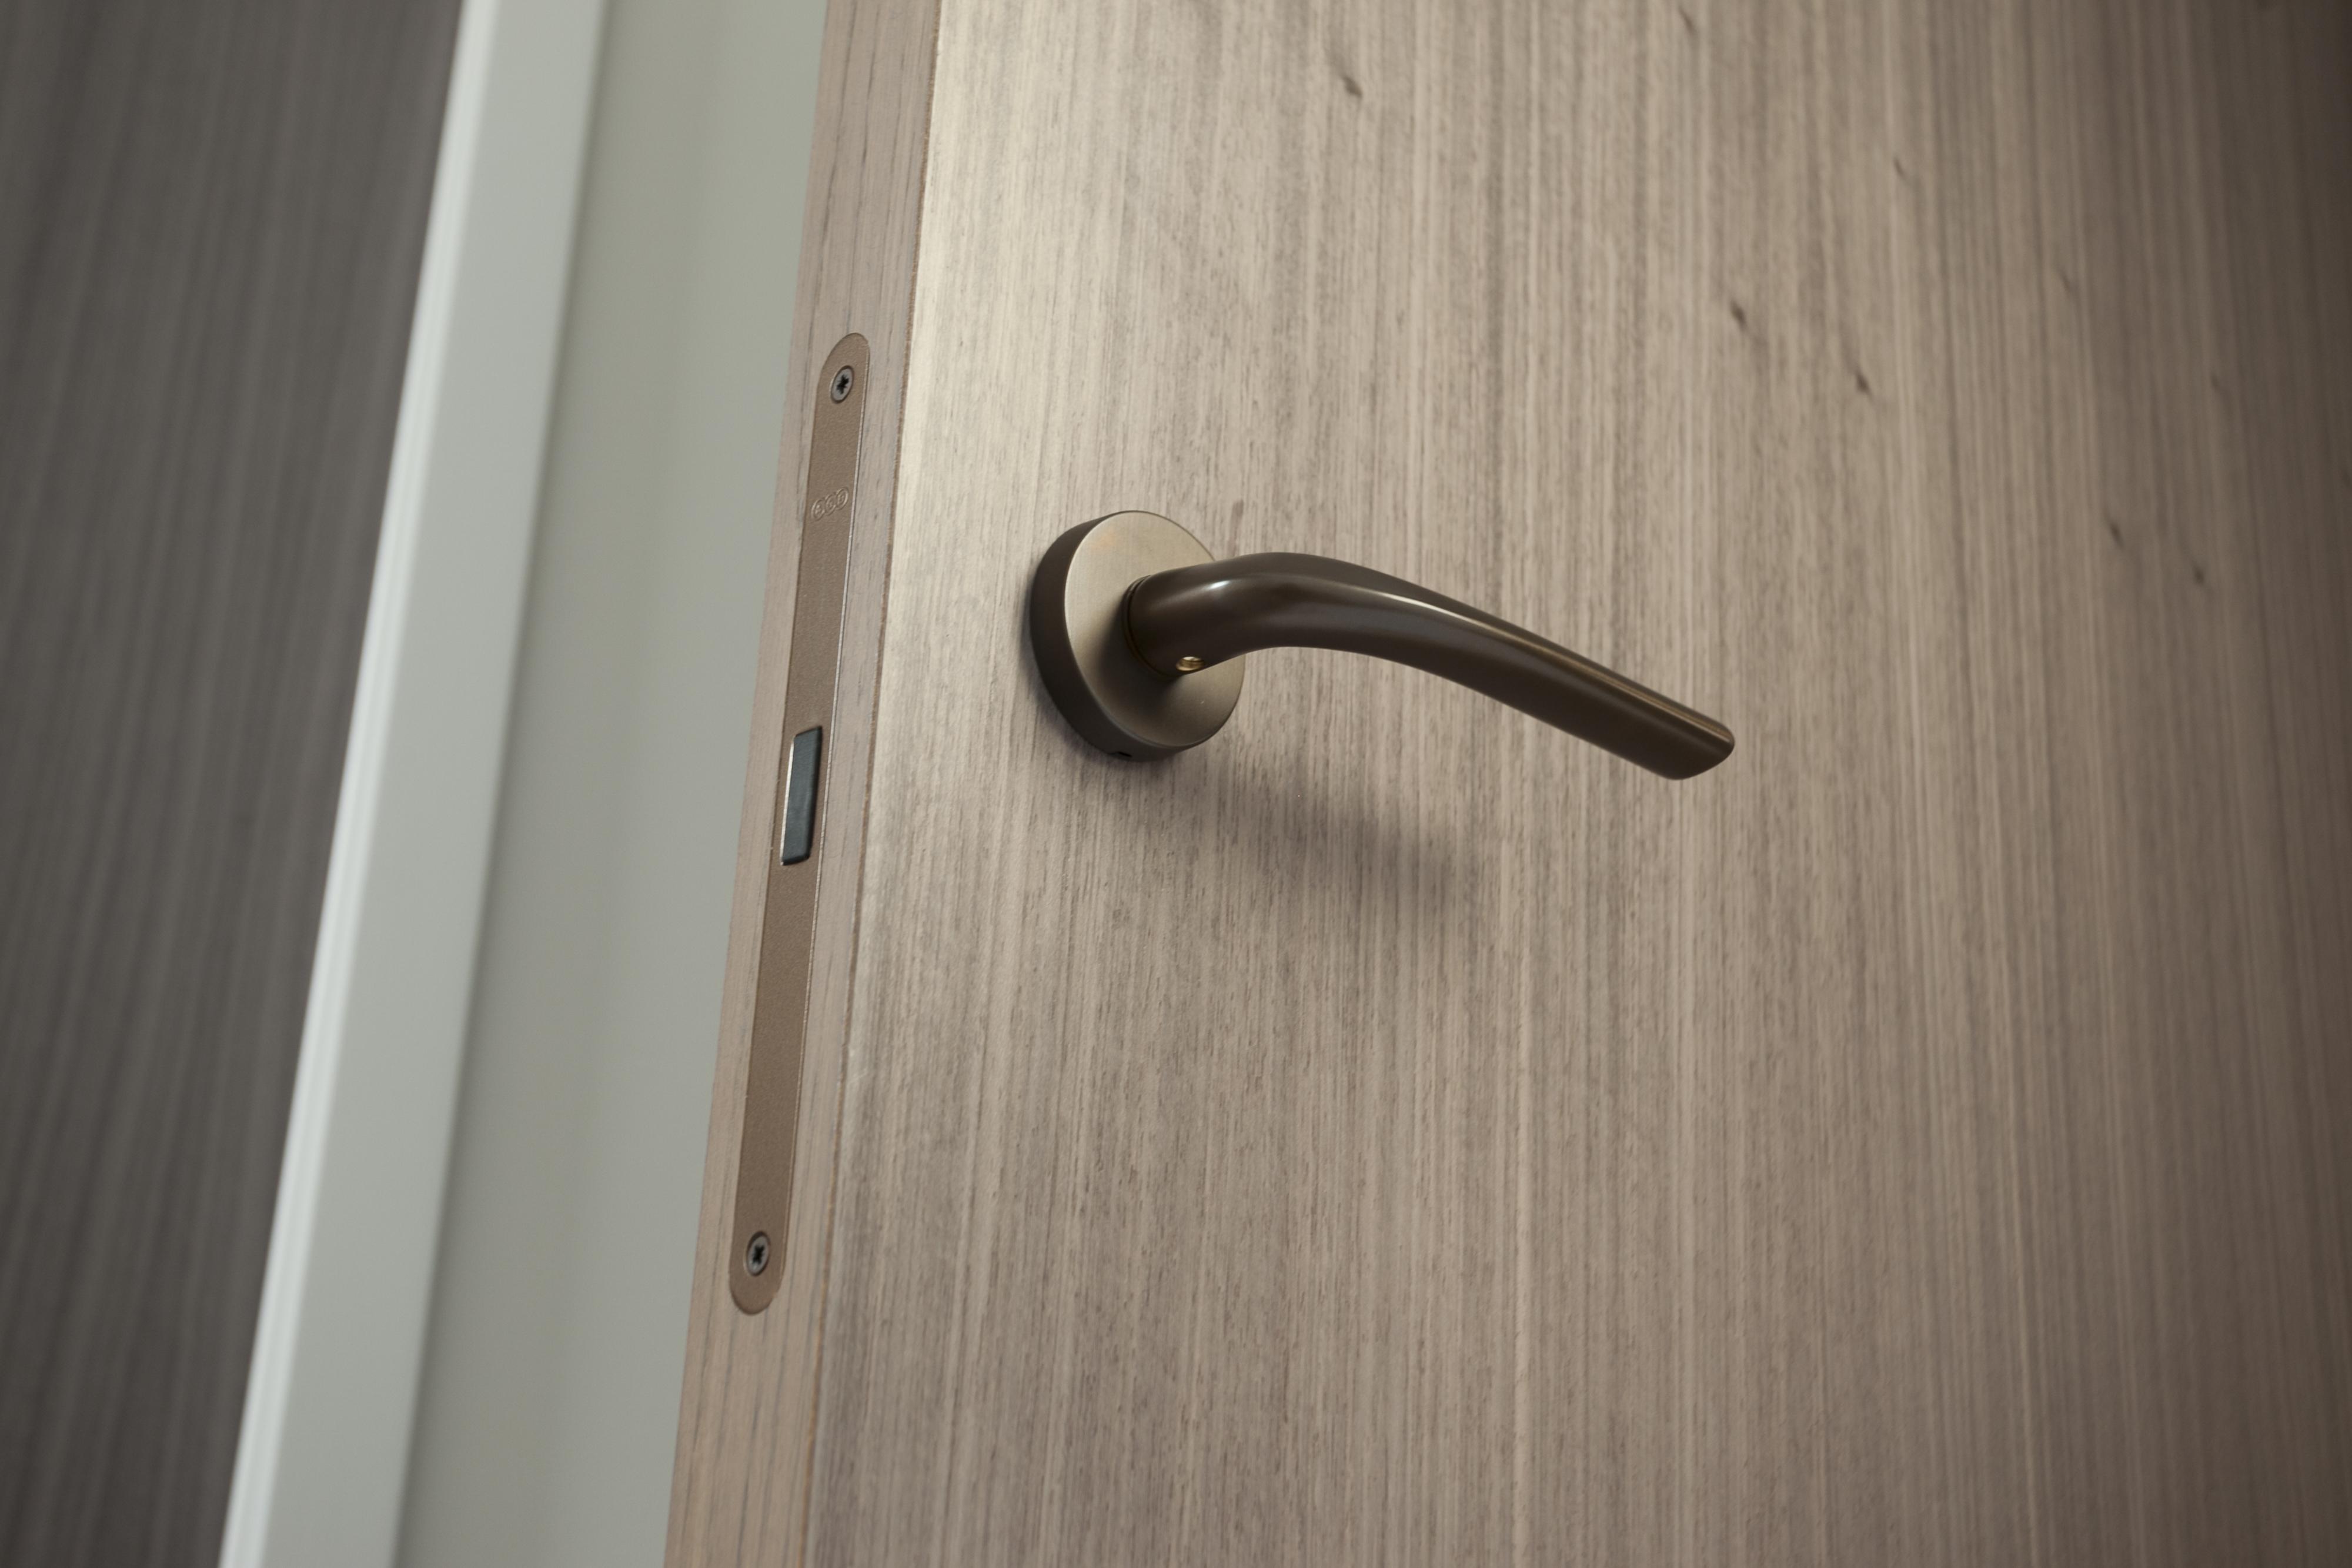 Stained Door with Integra Living Ironmongery